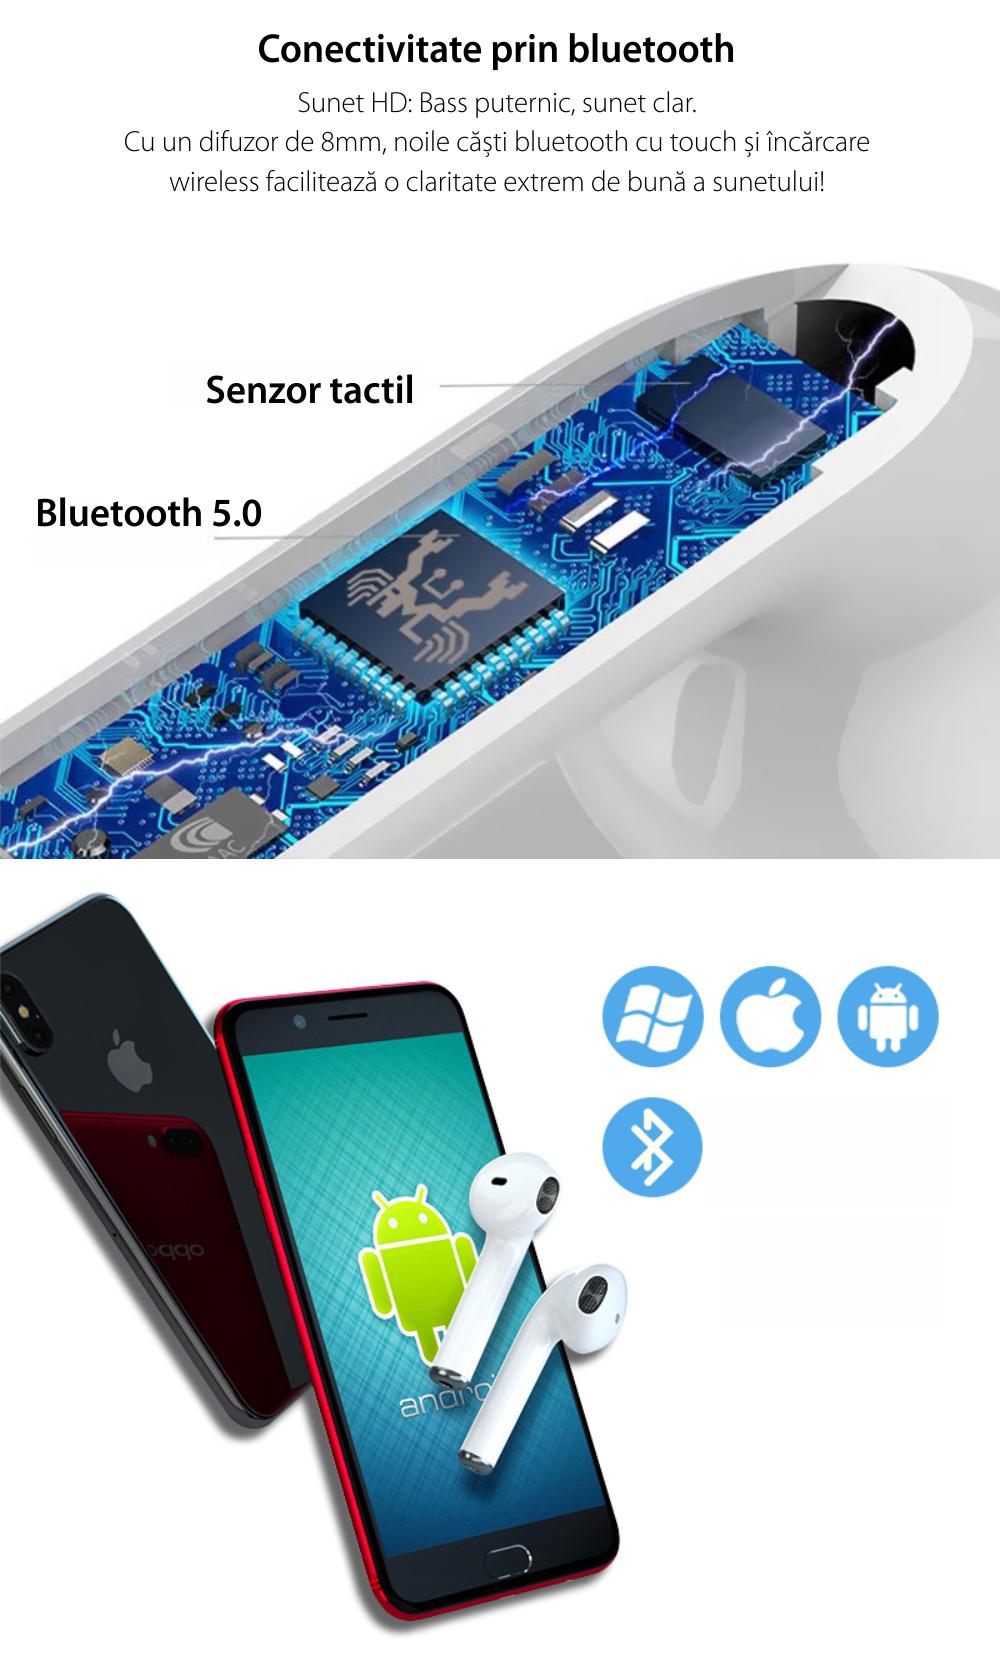 Casti wireless Bluetooth I11 Stereo cu Functie apelare, Control muzica, Cutie incarcare inclusa, Reducere zgomot, Android/ iOS, Alb